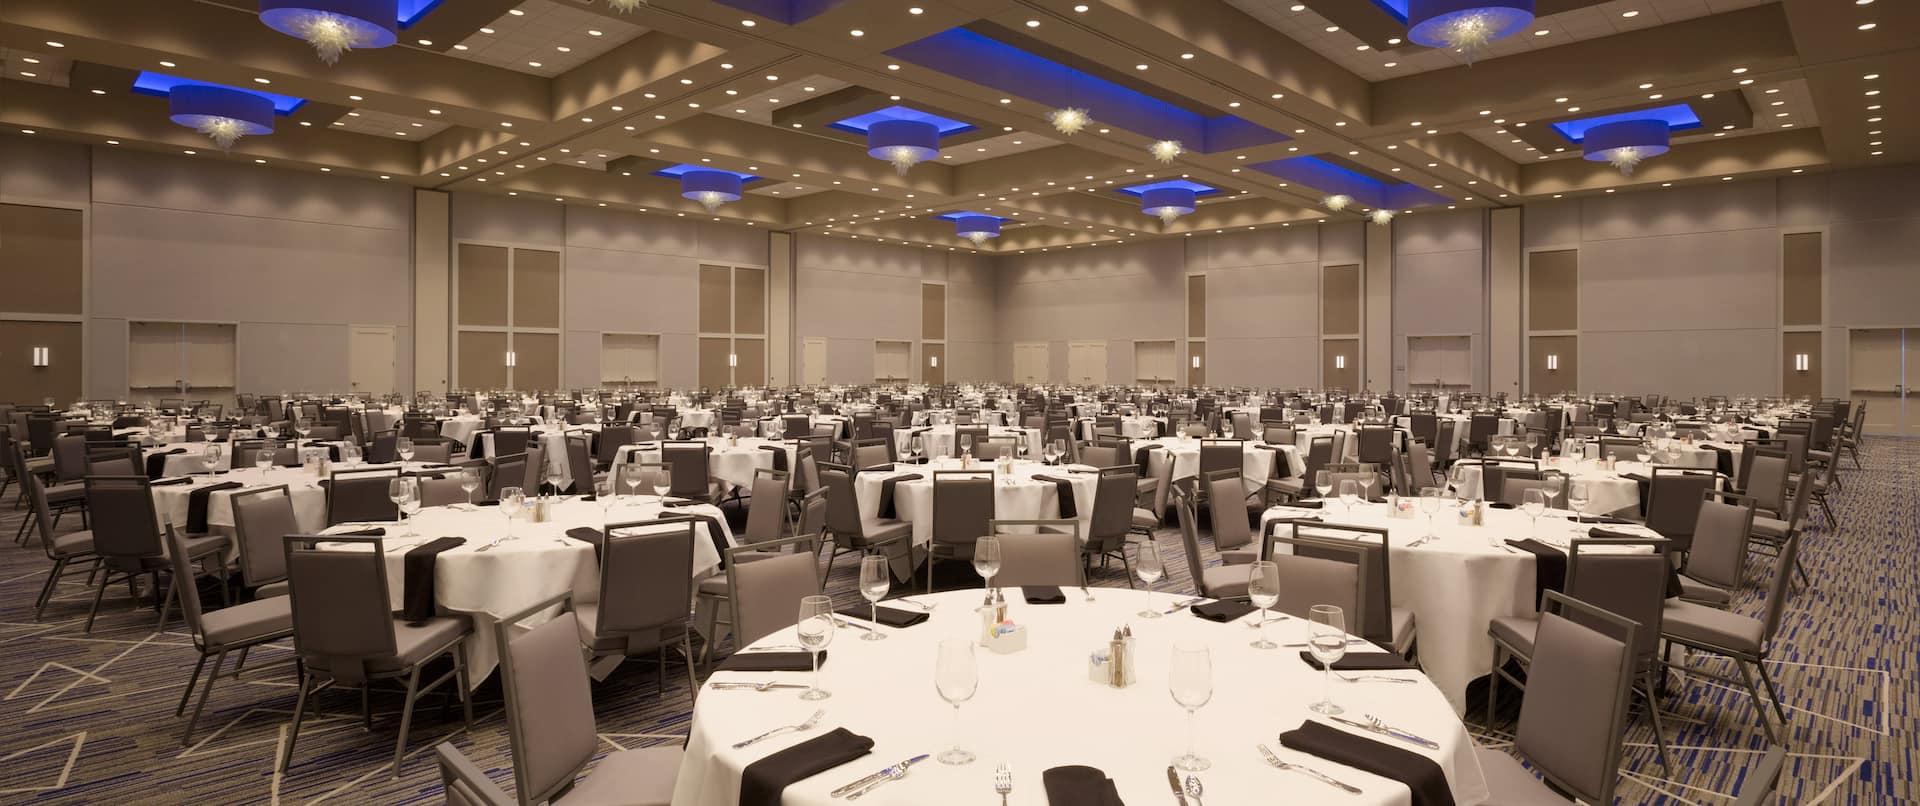 Meeting Room Banquet Set Up